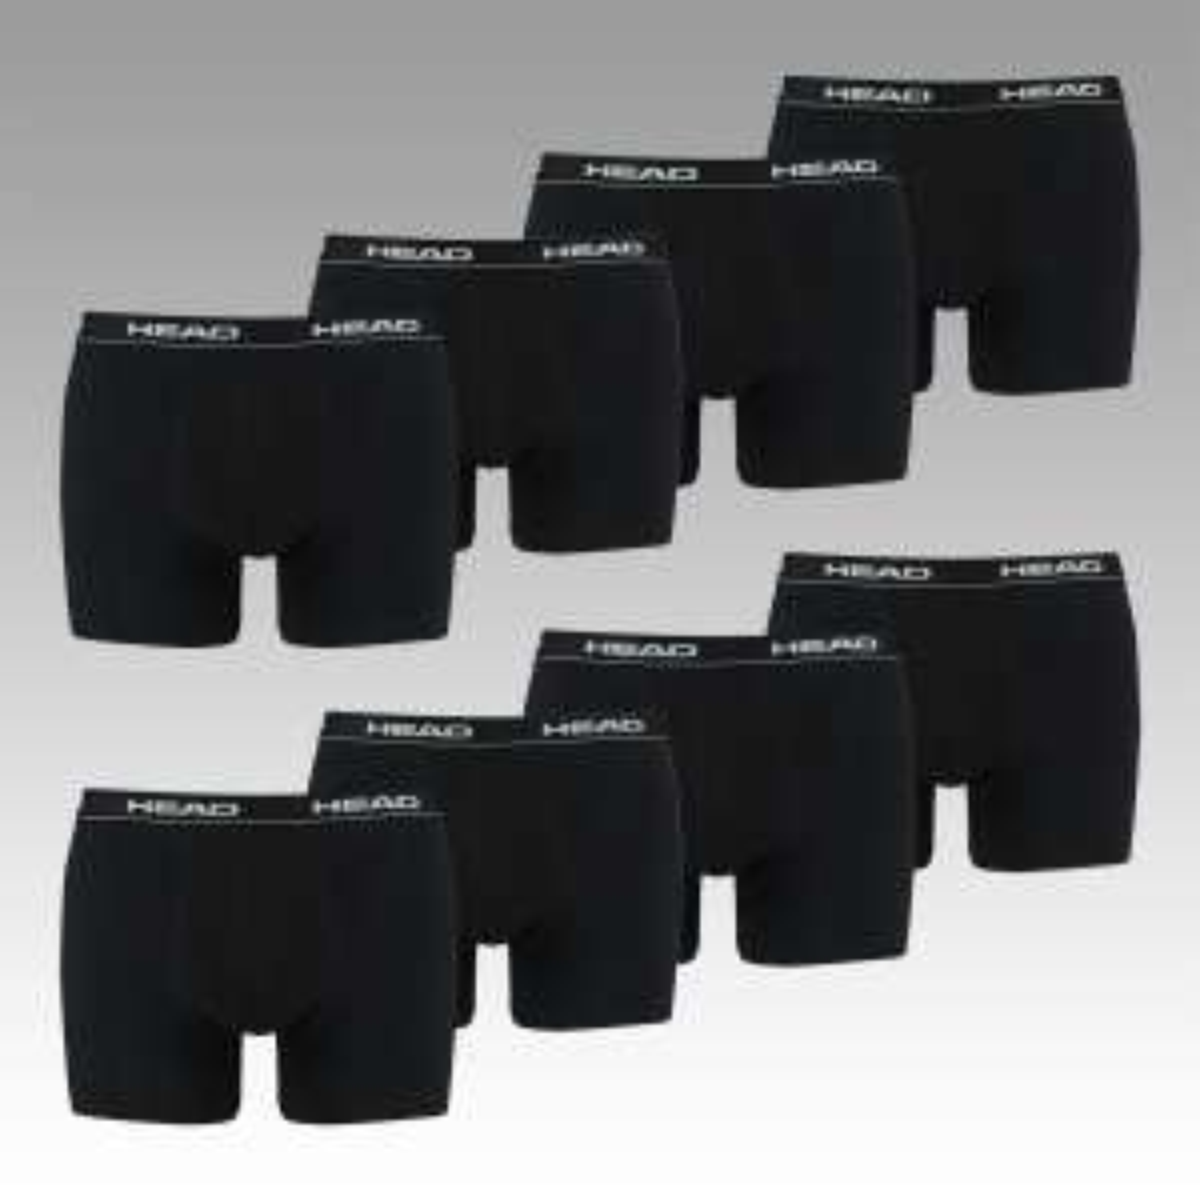 HEAD basic boxershorts 8-pack €23,95 @Allstar Sport